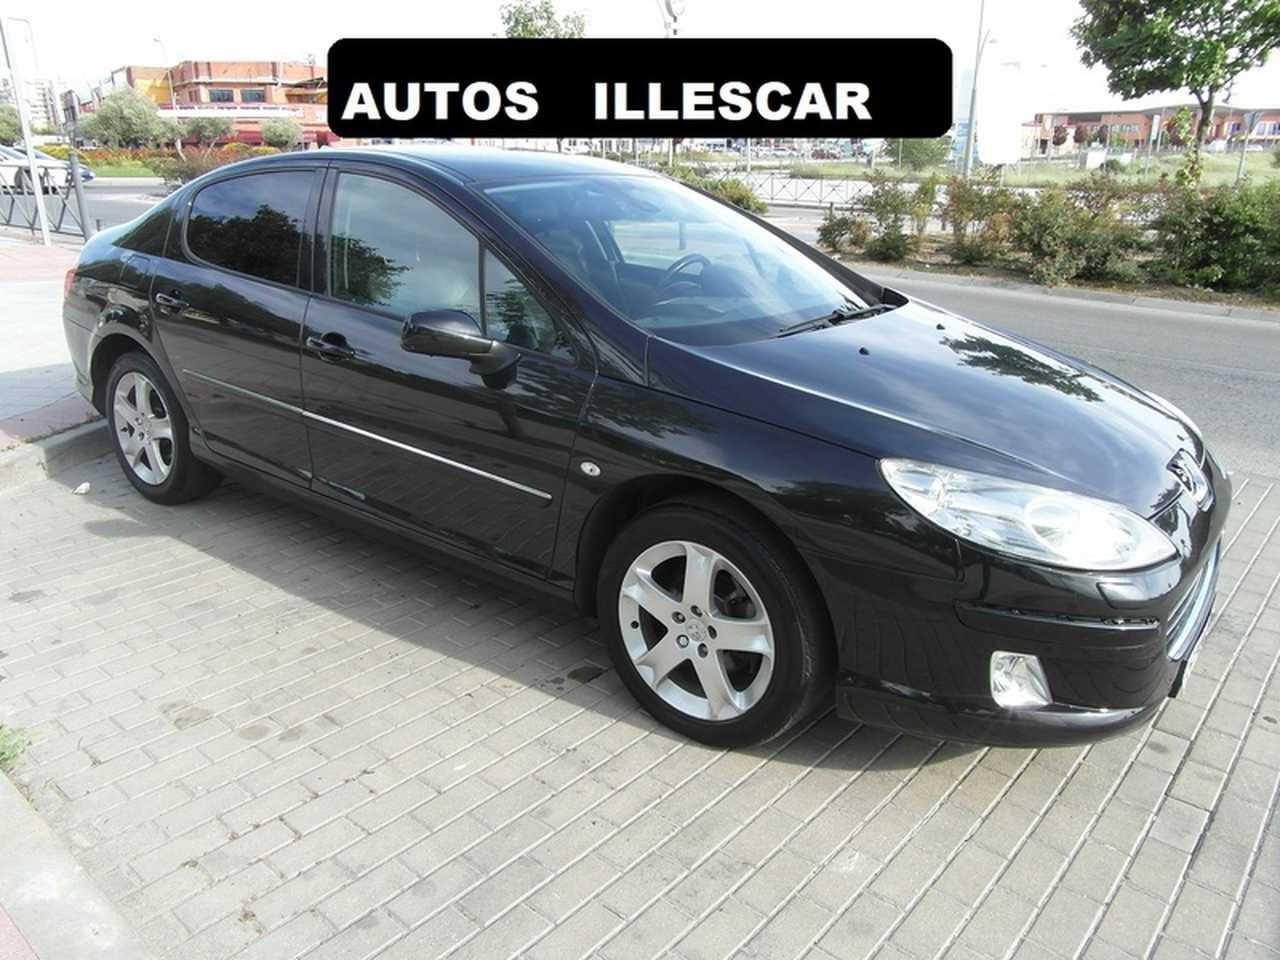 Peugeot 407 2.0 HDI SPORT 136 CV KILOMETROS EN CARRETERA  - Foto 1